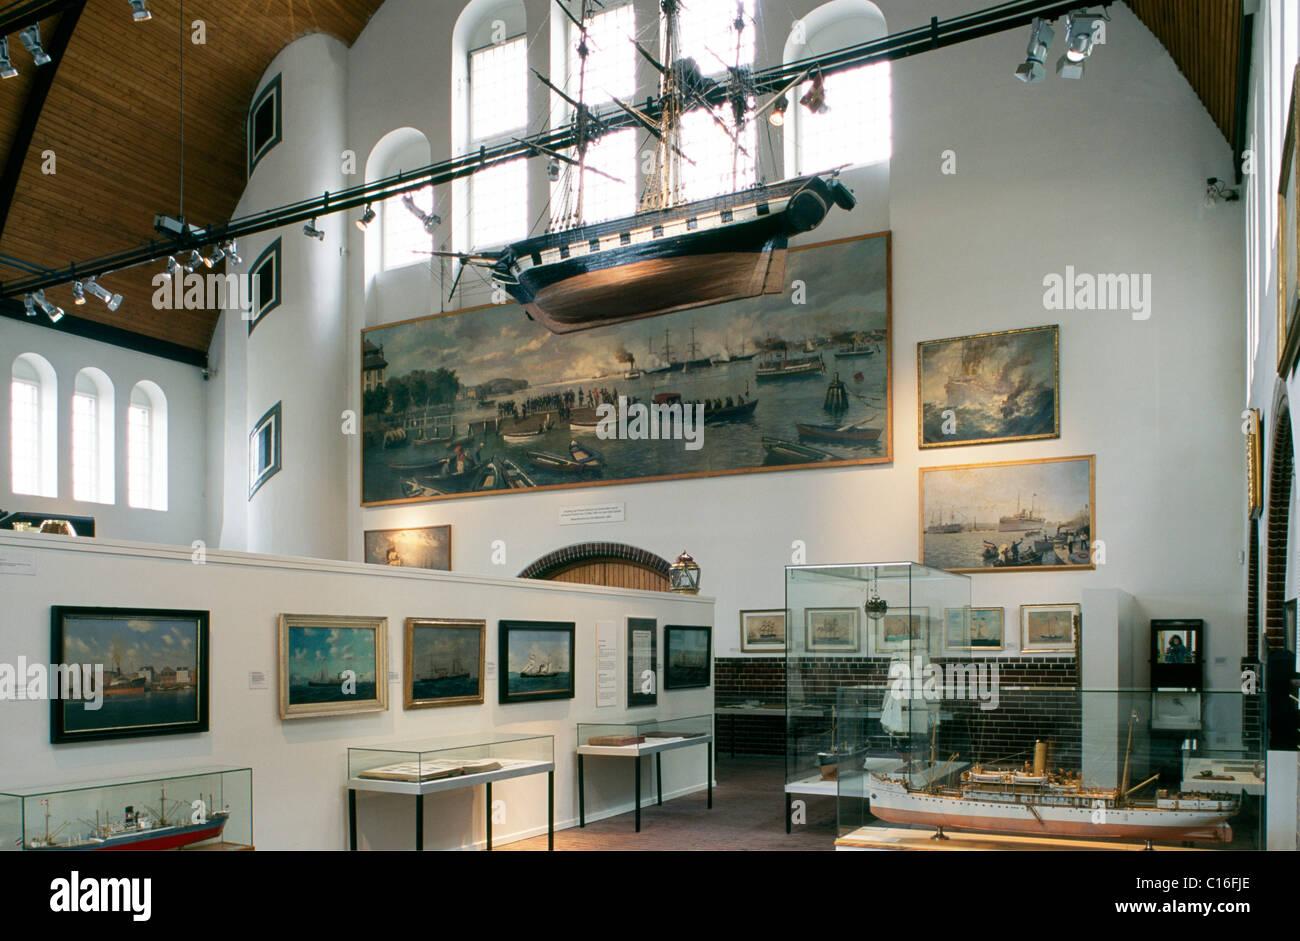 Schifffahrtsmuseum or Maritime Museum in Kiel, Schleswig-Holstein, Germany, Europe Stock Photo